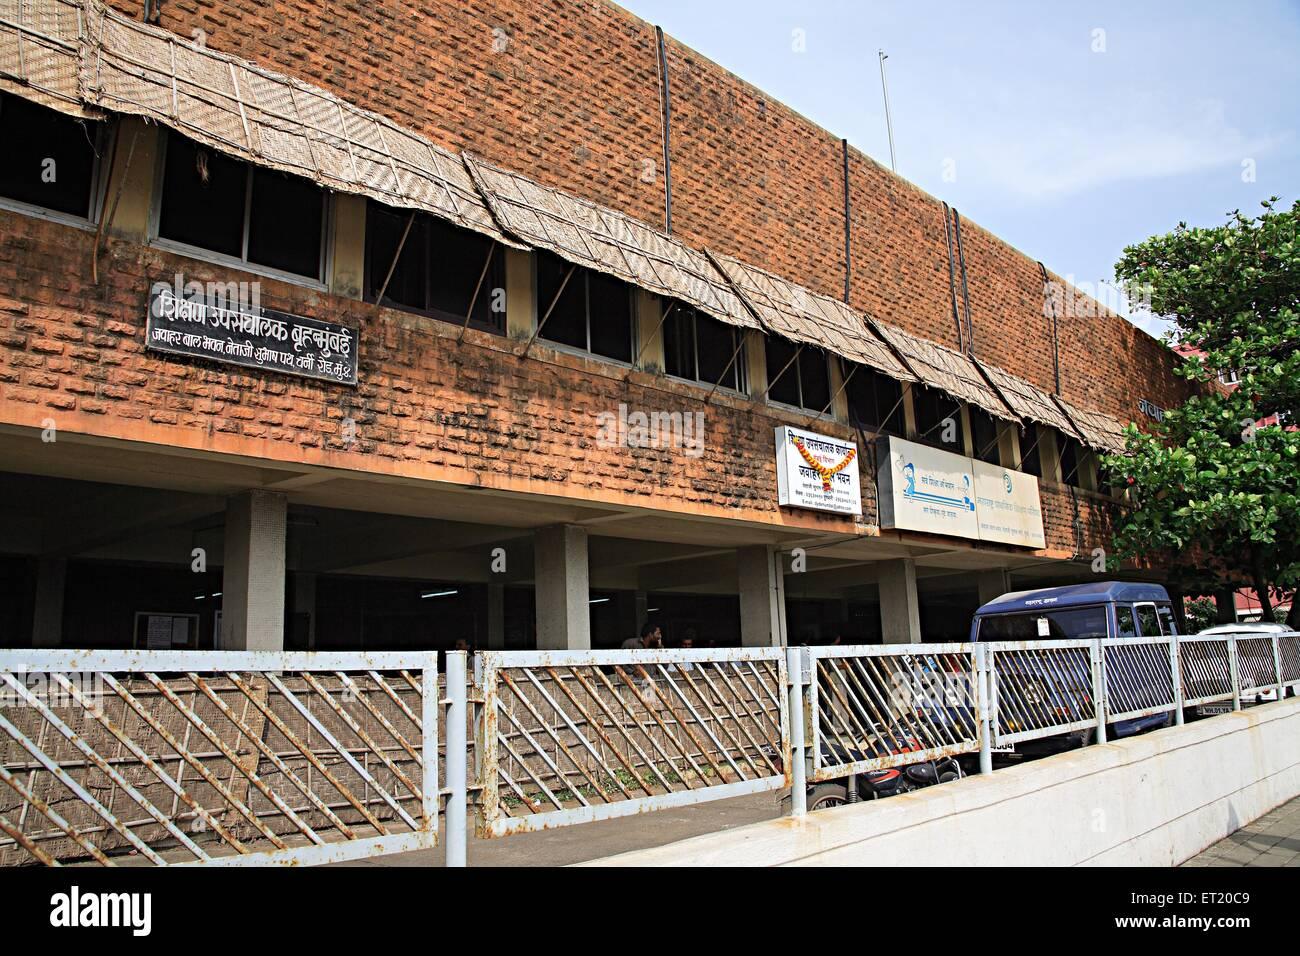 Jawahar Bal Bhavan Maharashtra Primary Education Office ; Netaji Subhash Chandra Bose road ; Girgaon ; Charni road - Stock Image